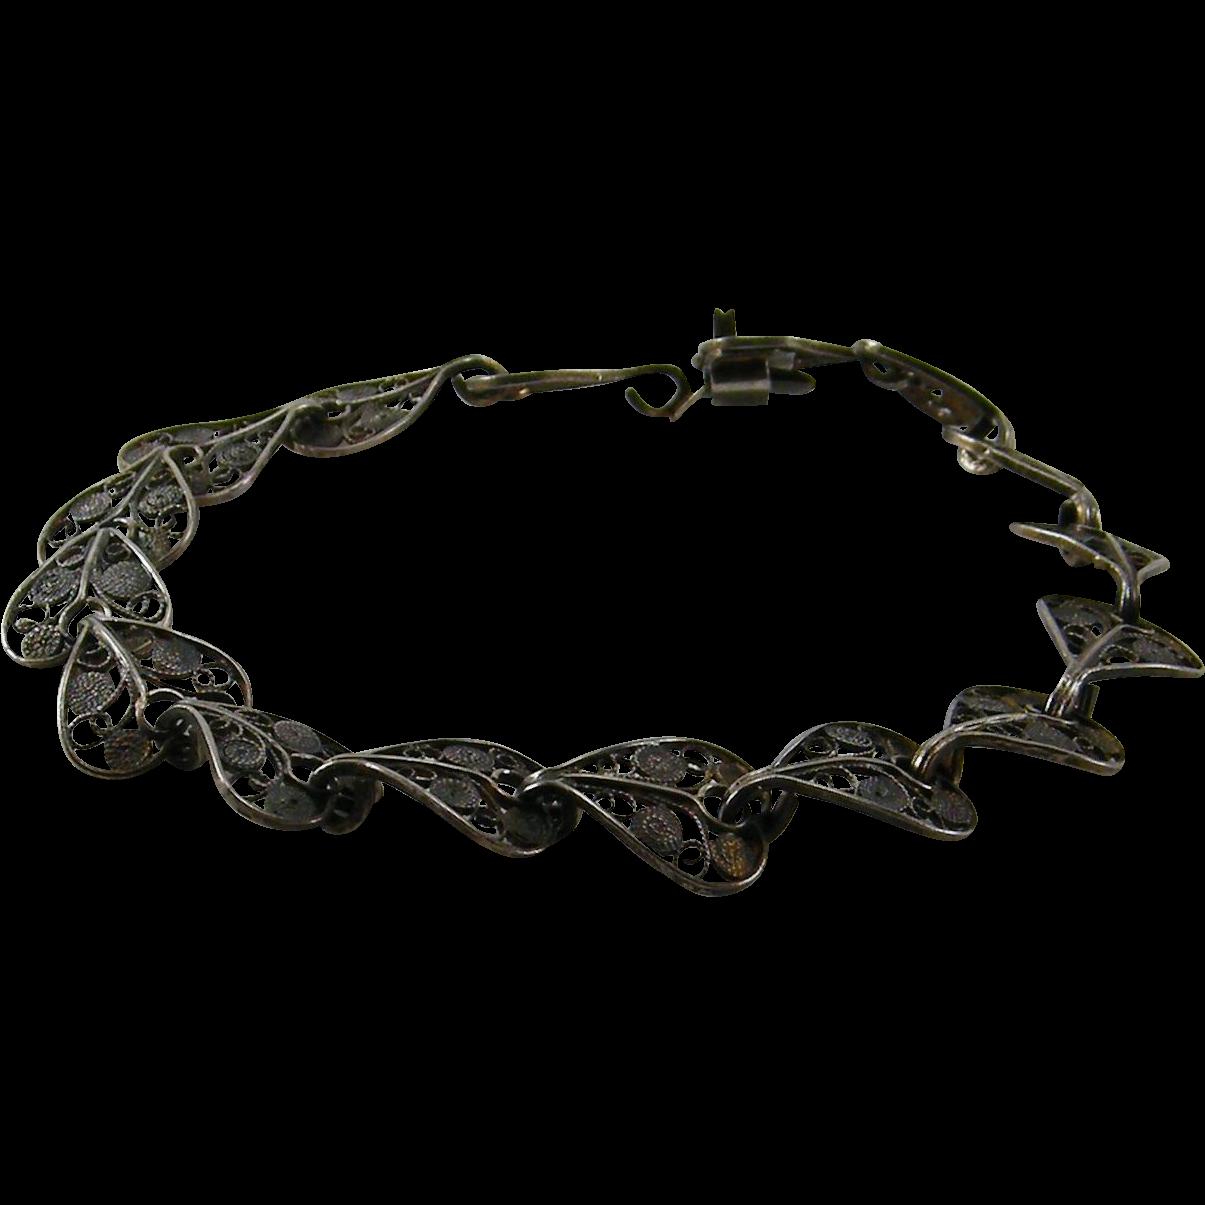 800 Silver Fine Wire Work Bracelet Heart or Leaf Design